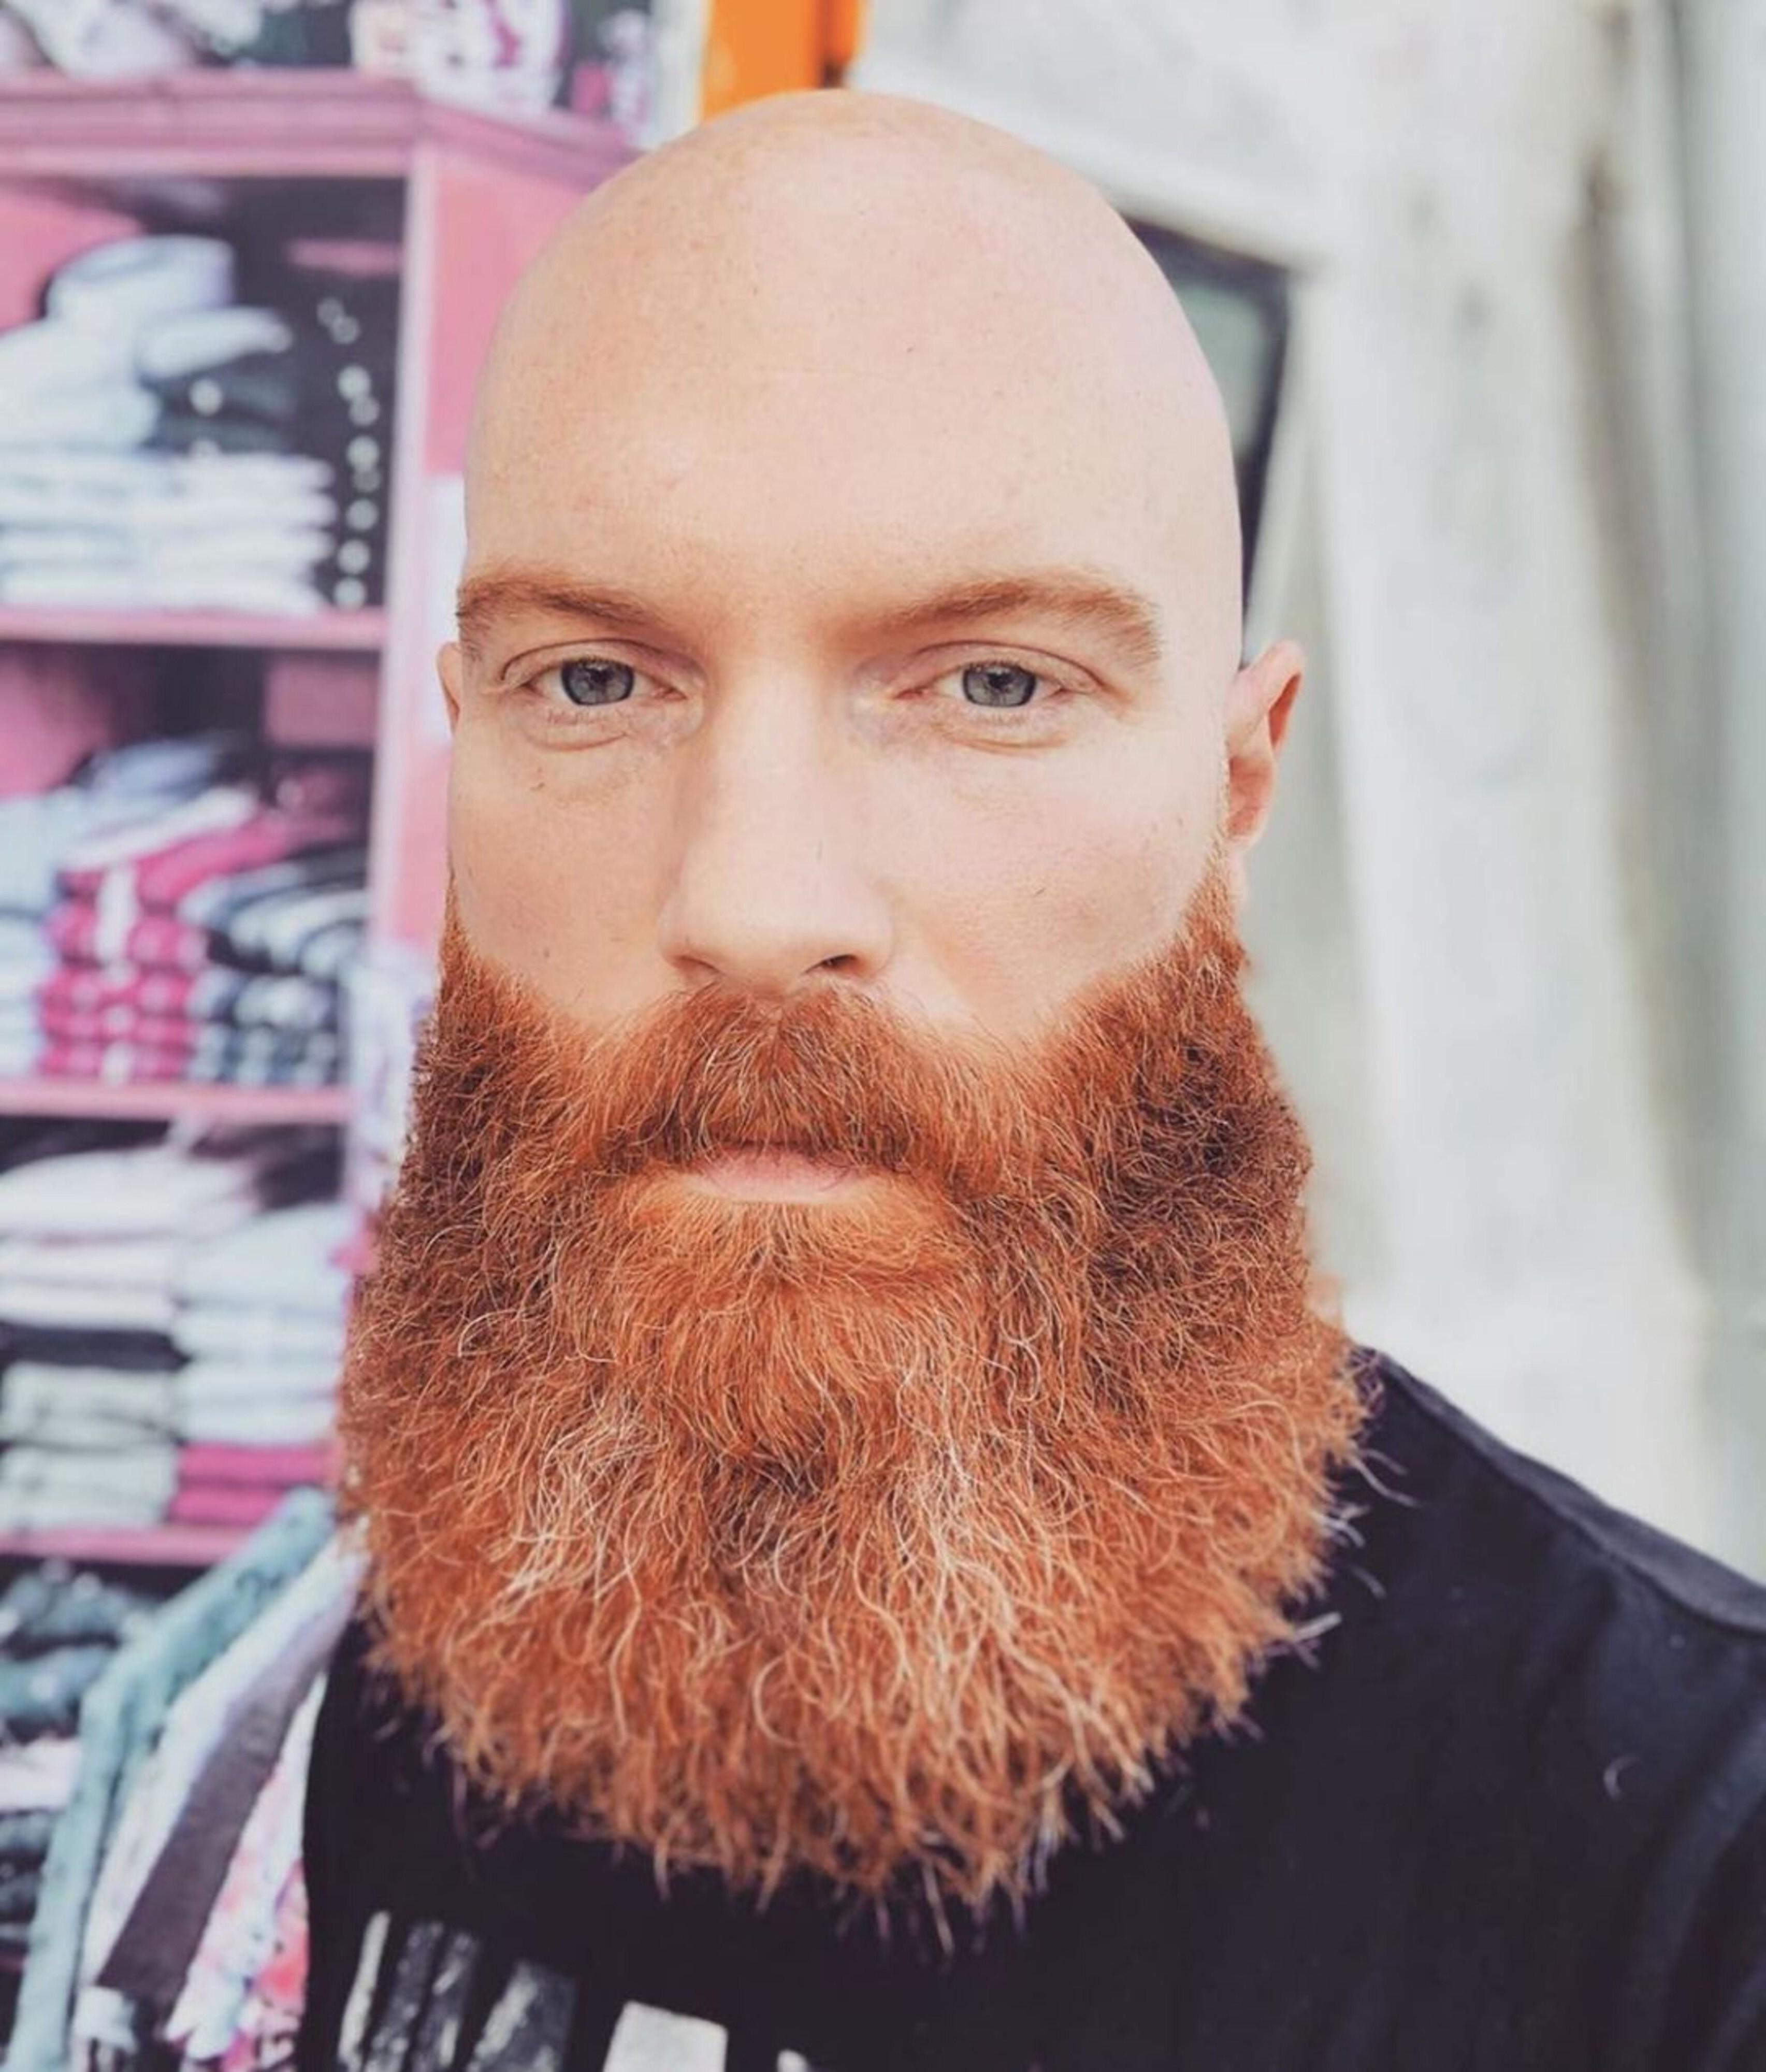 A long beard of the orange color.